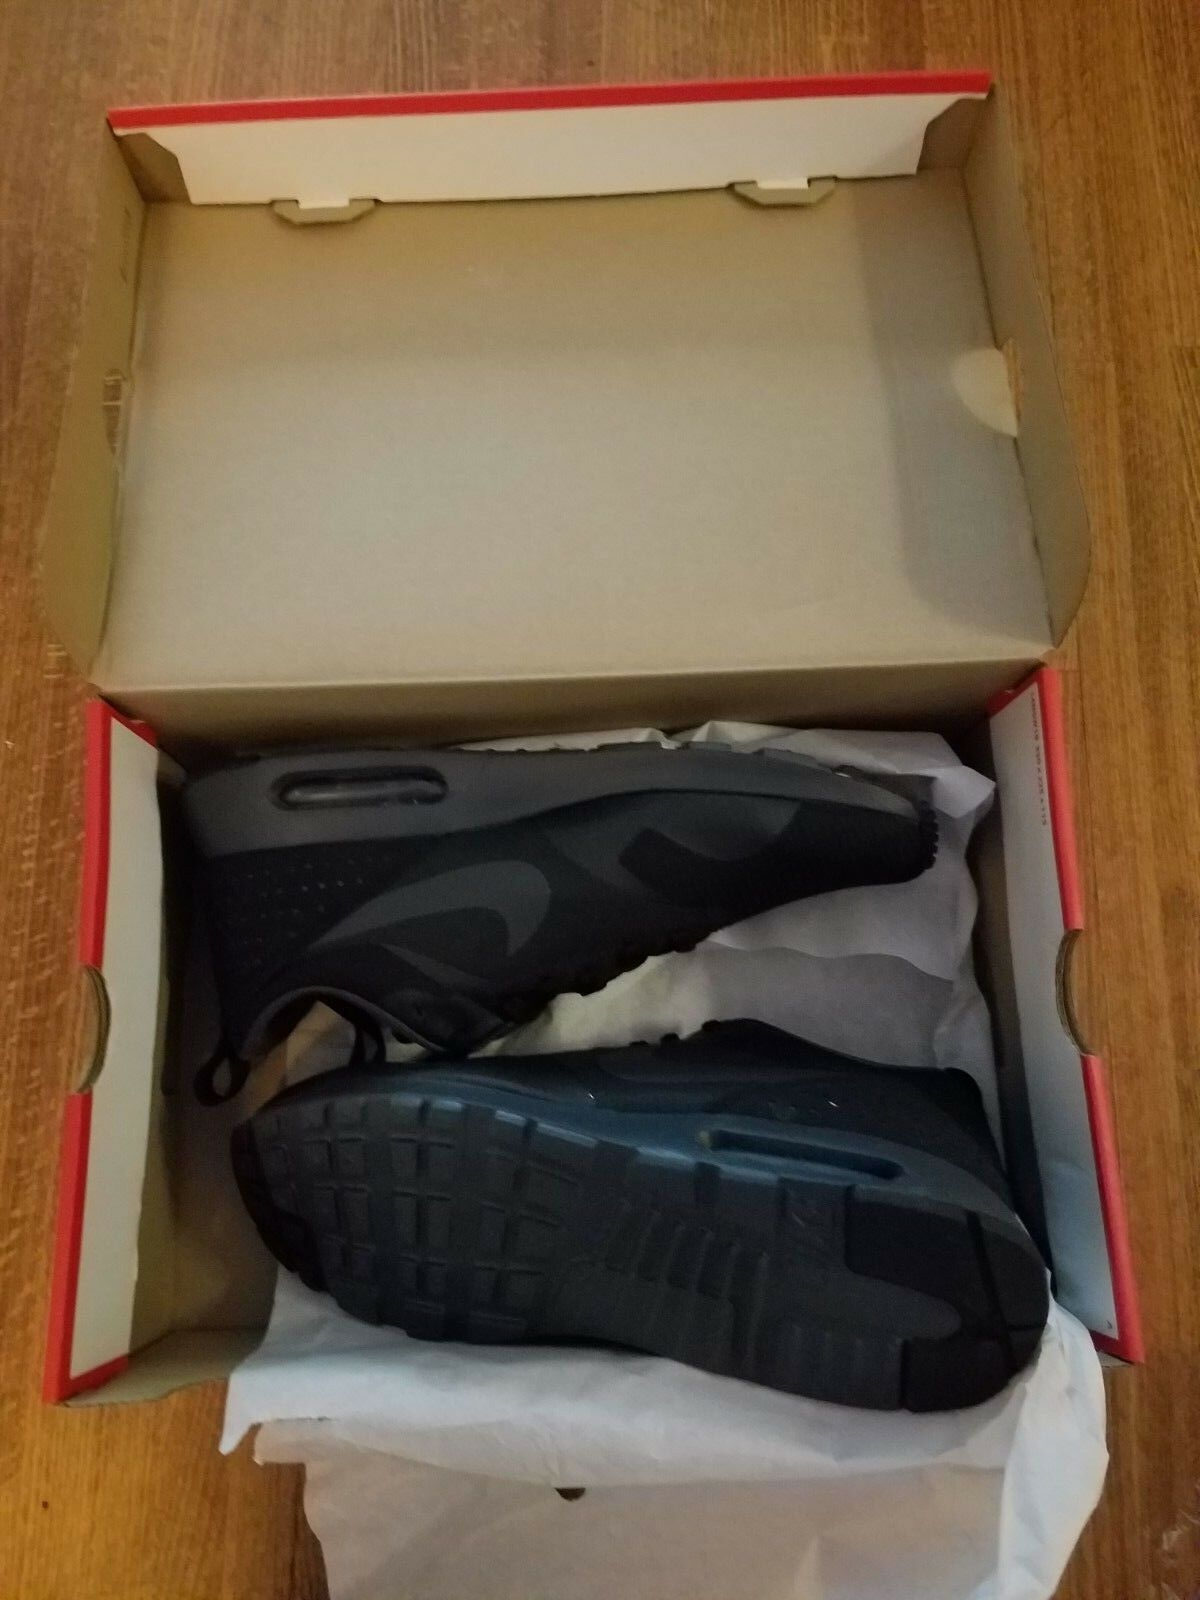 Nike air max tavas scarpe neri antracite 705149-010 nuovi uomini